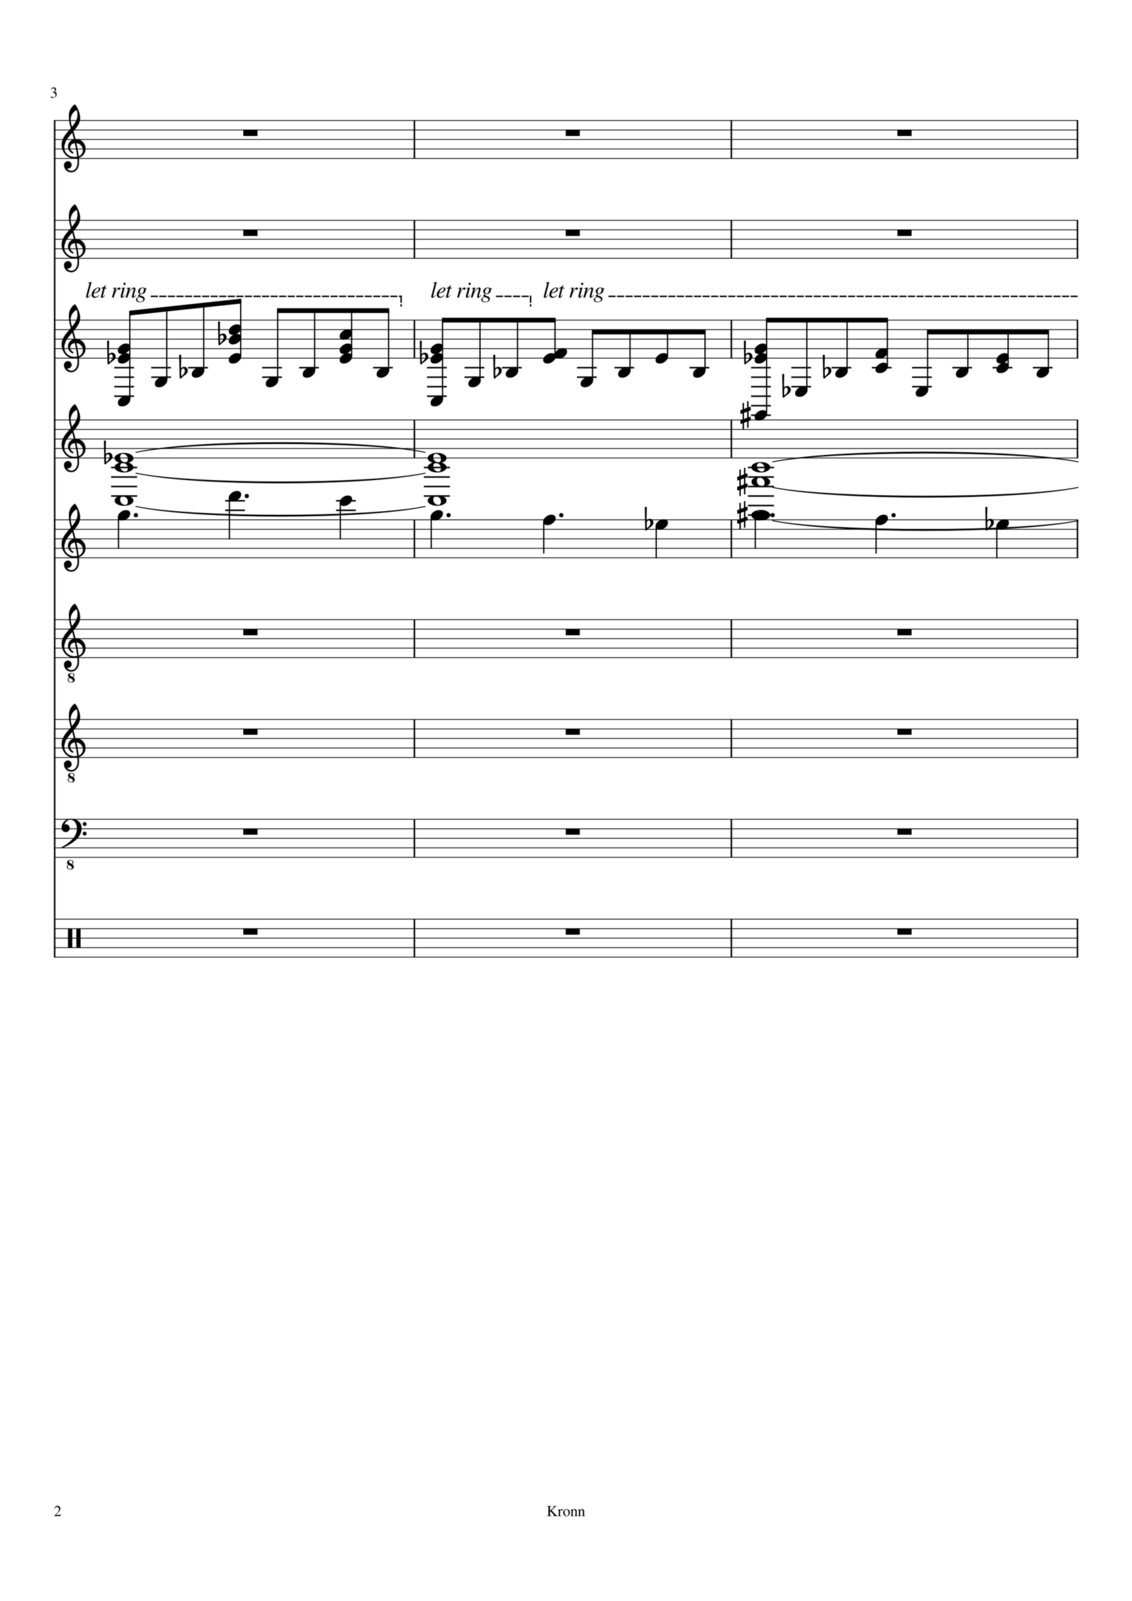 Okean Pustotyi slide, Image 2